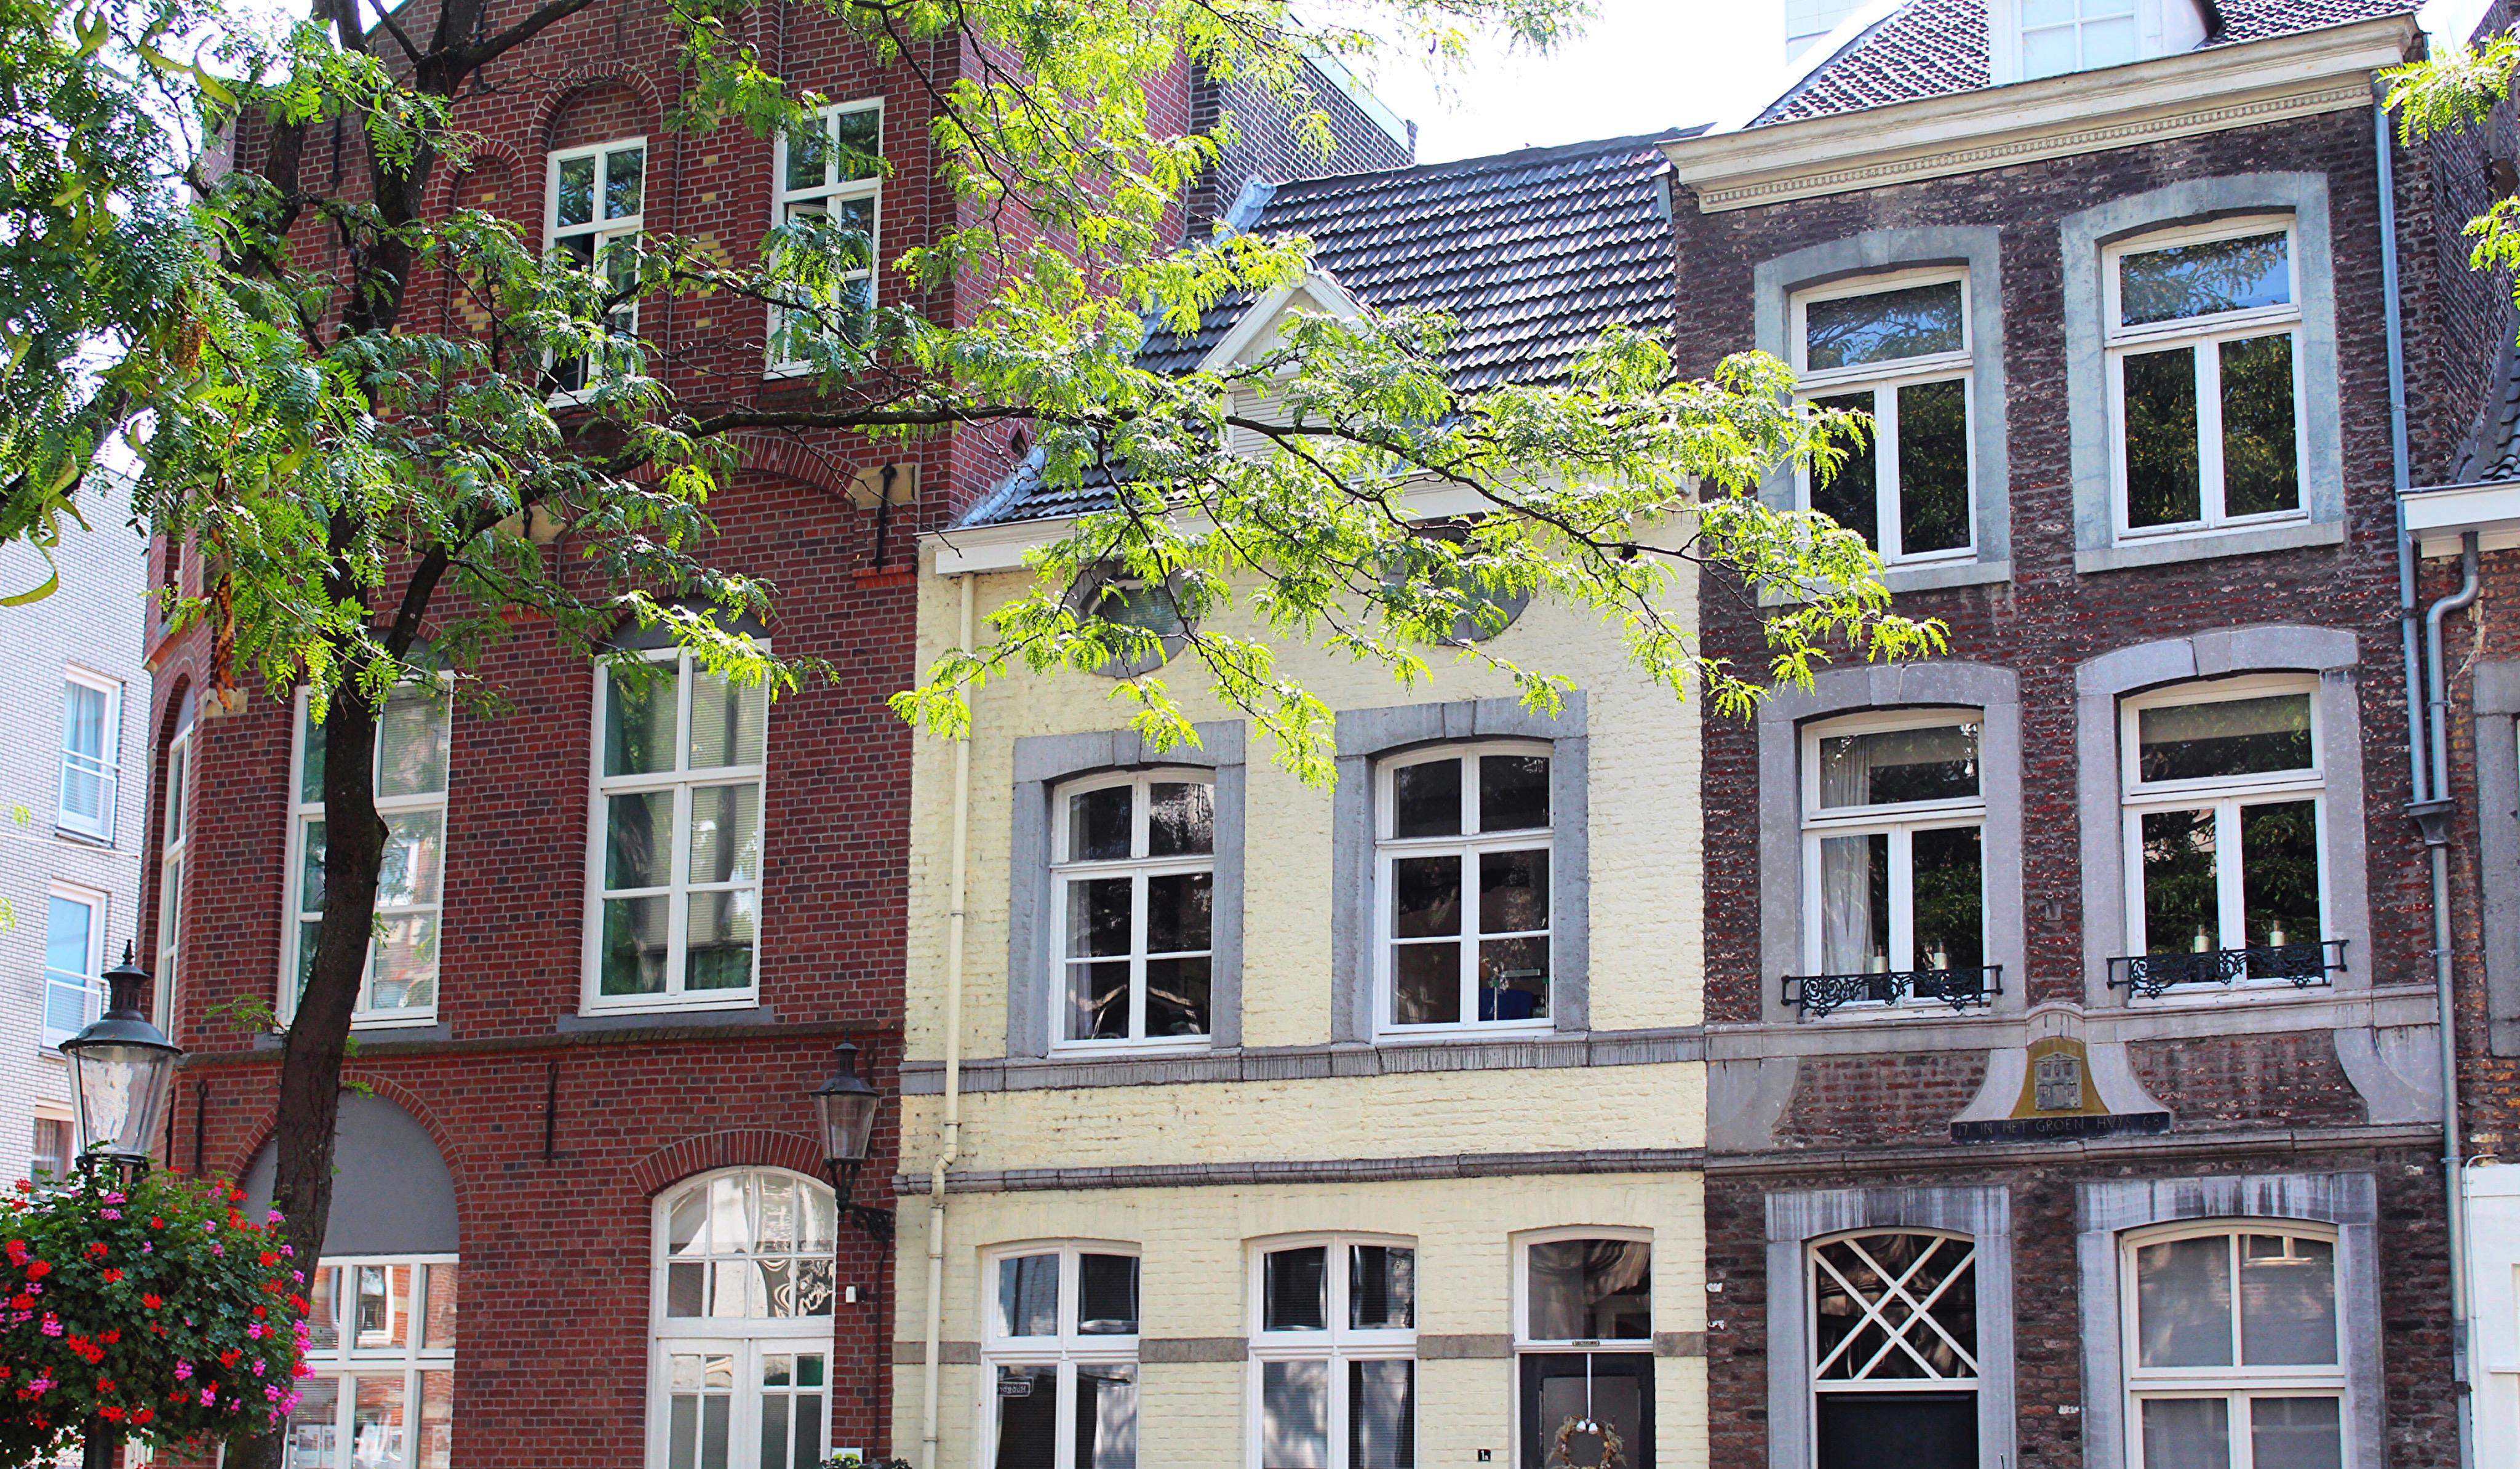 maastricht facades